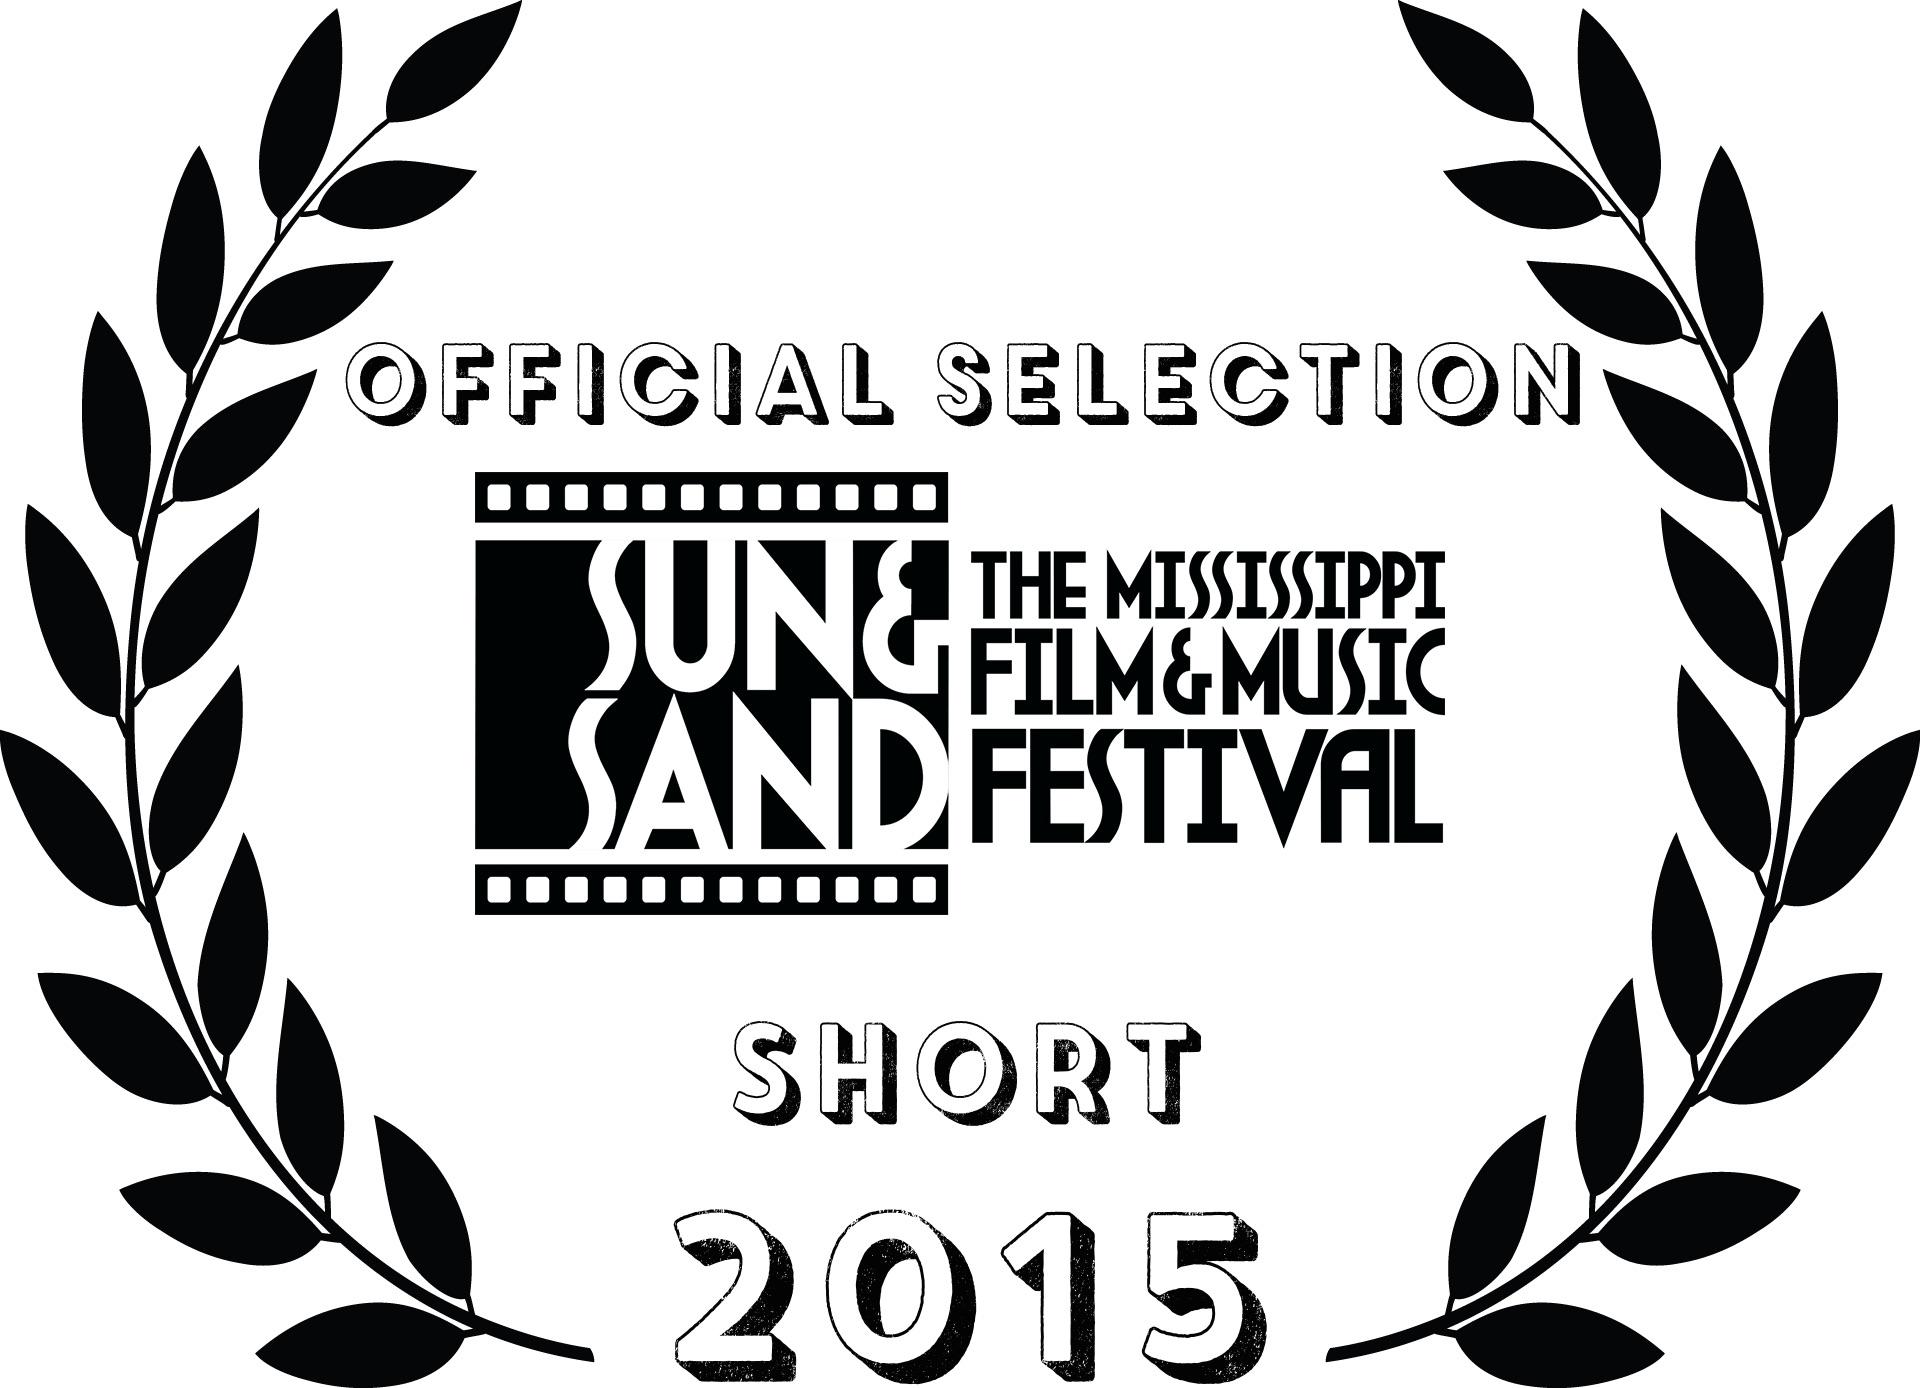 OFFICIAL SELECTION - THE MISSISSIPPI FILM&MUSIC FESTIVAL - SHORT 2015